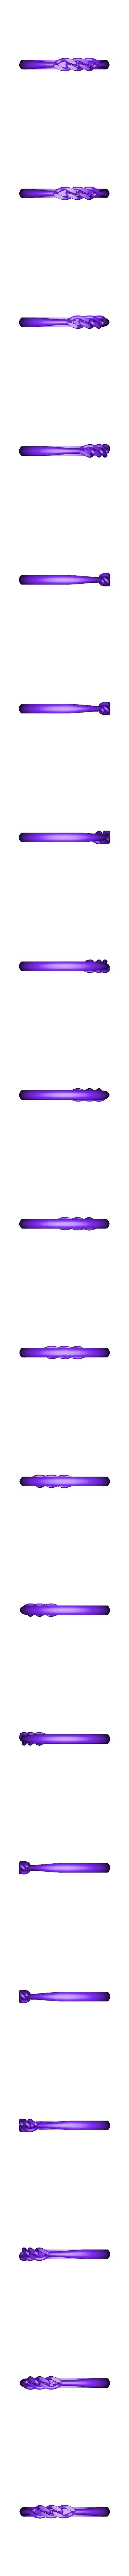 4.stl Download 3DS file Ring • 3D print model, Neel6462